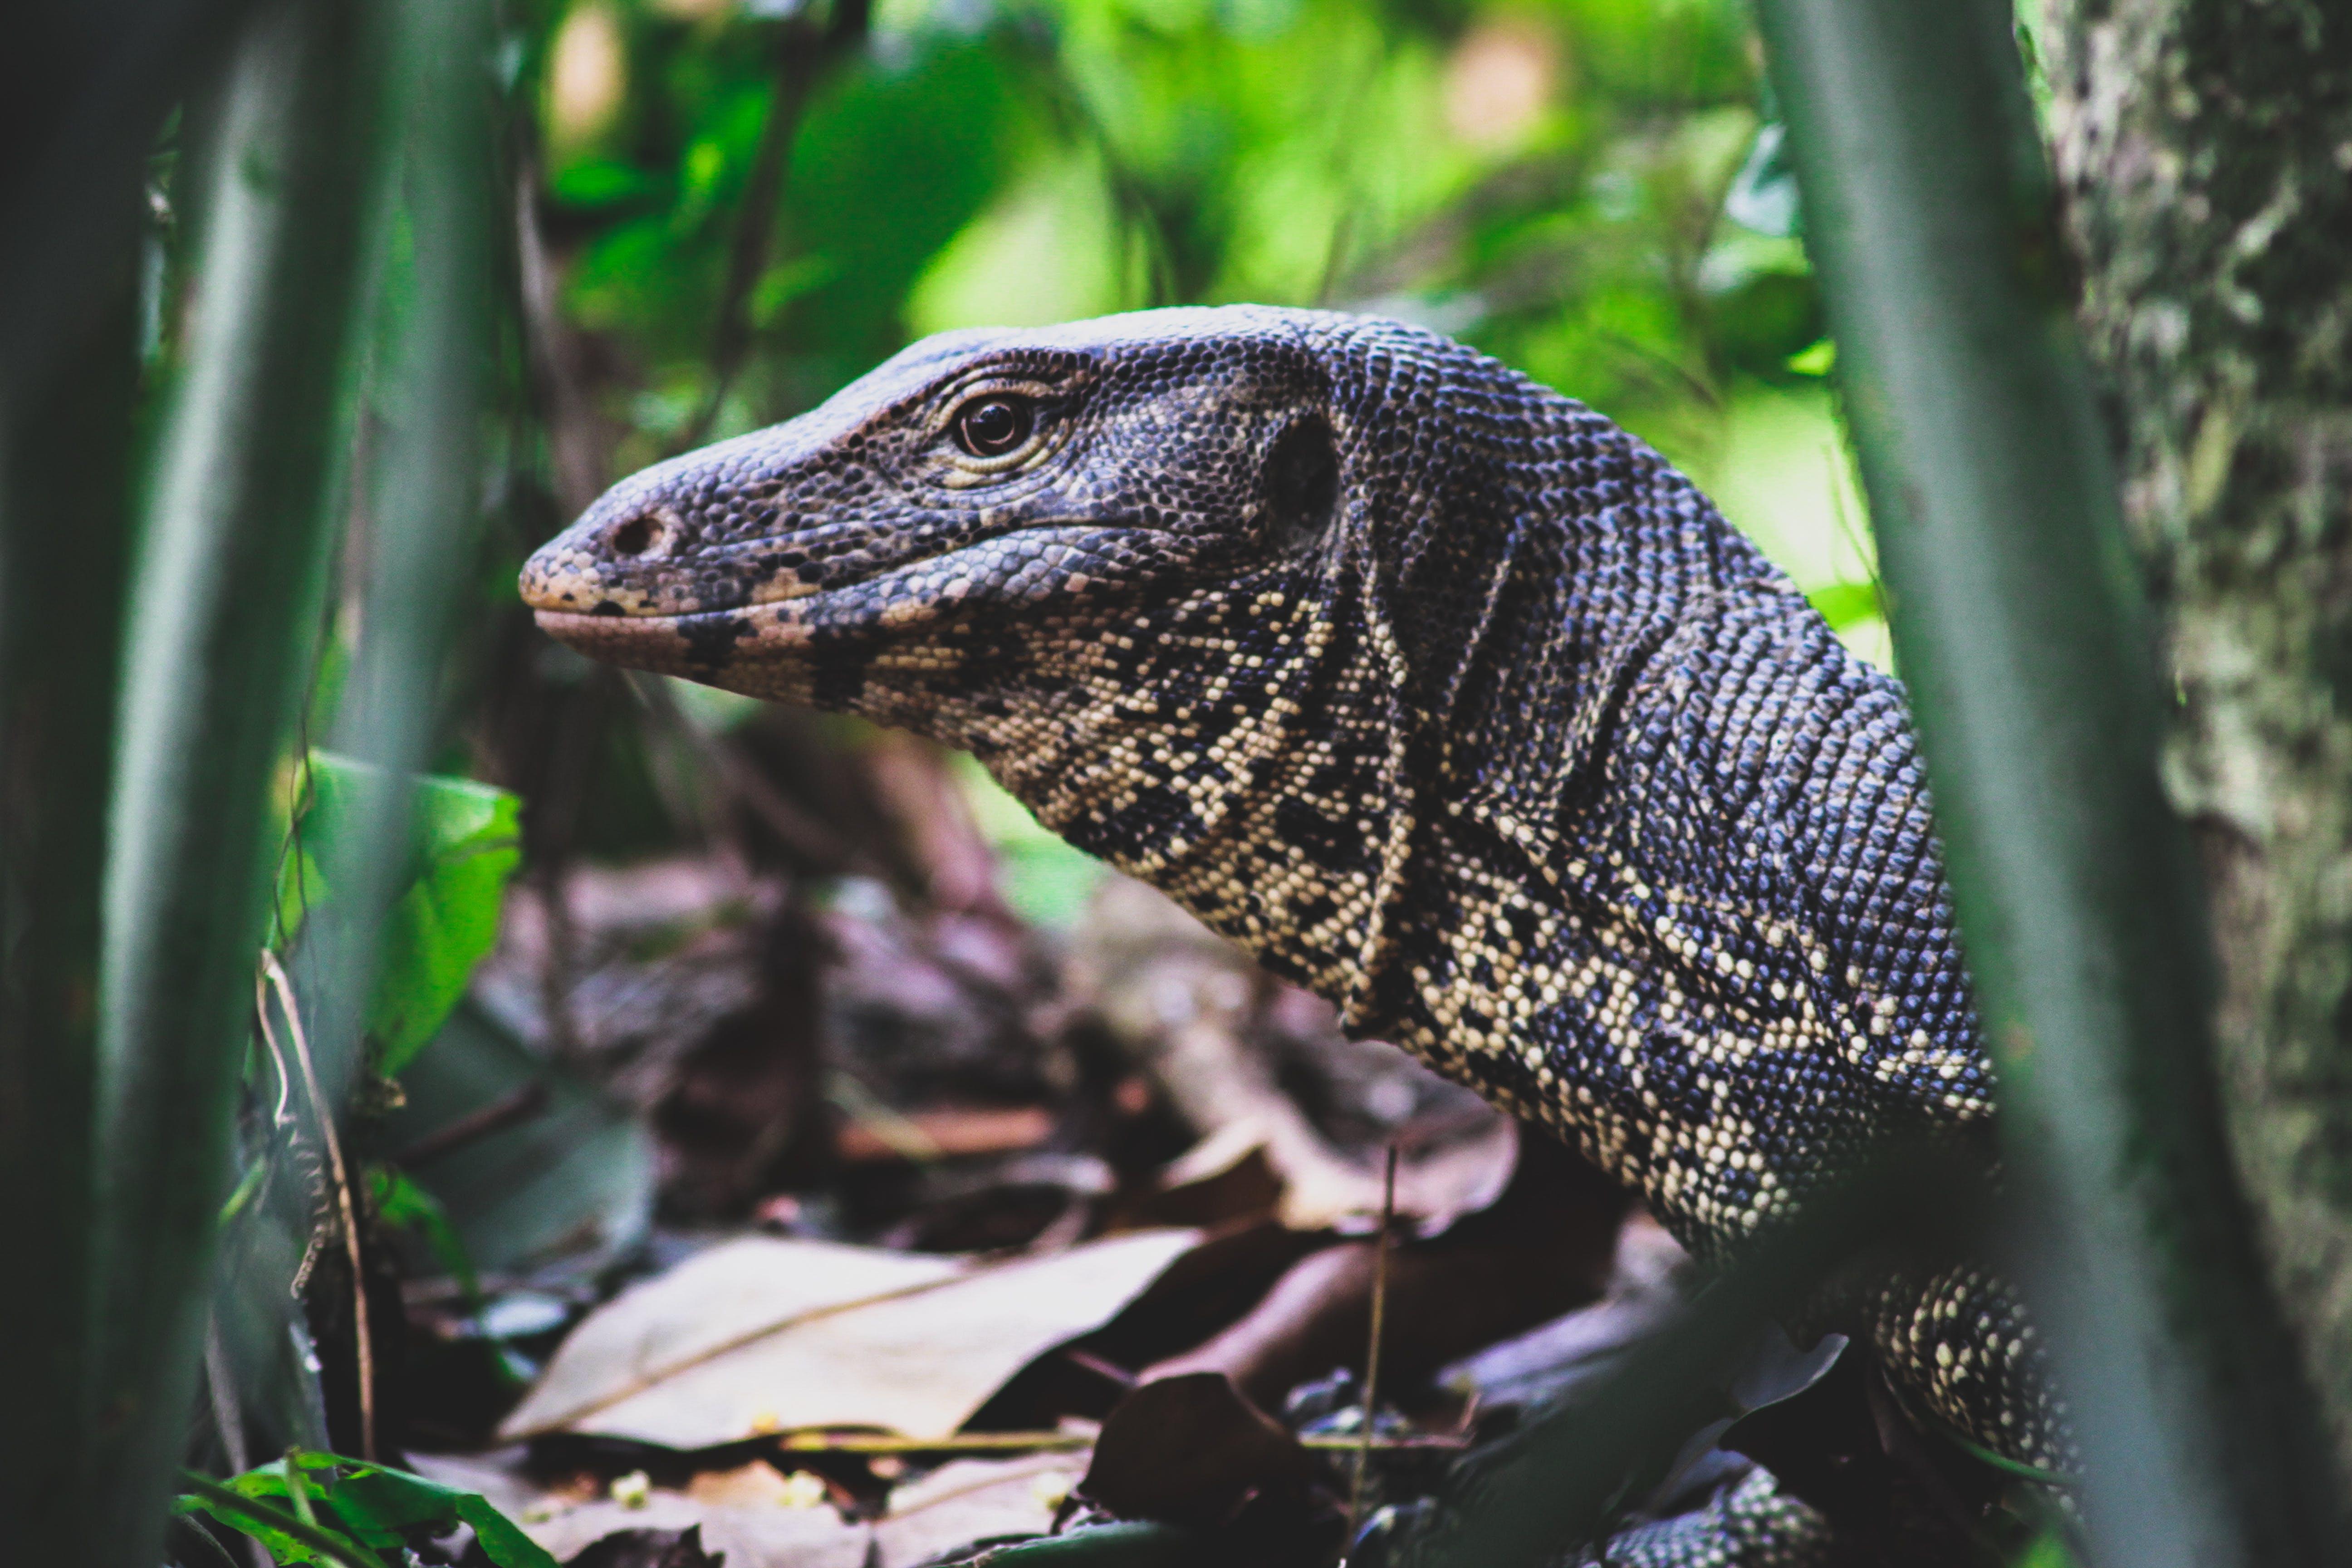 Kostnadsfri bild av dagsljus, djungel, djur, djurfotografi